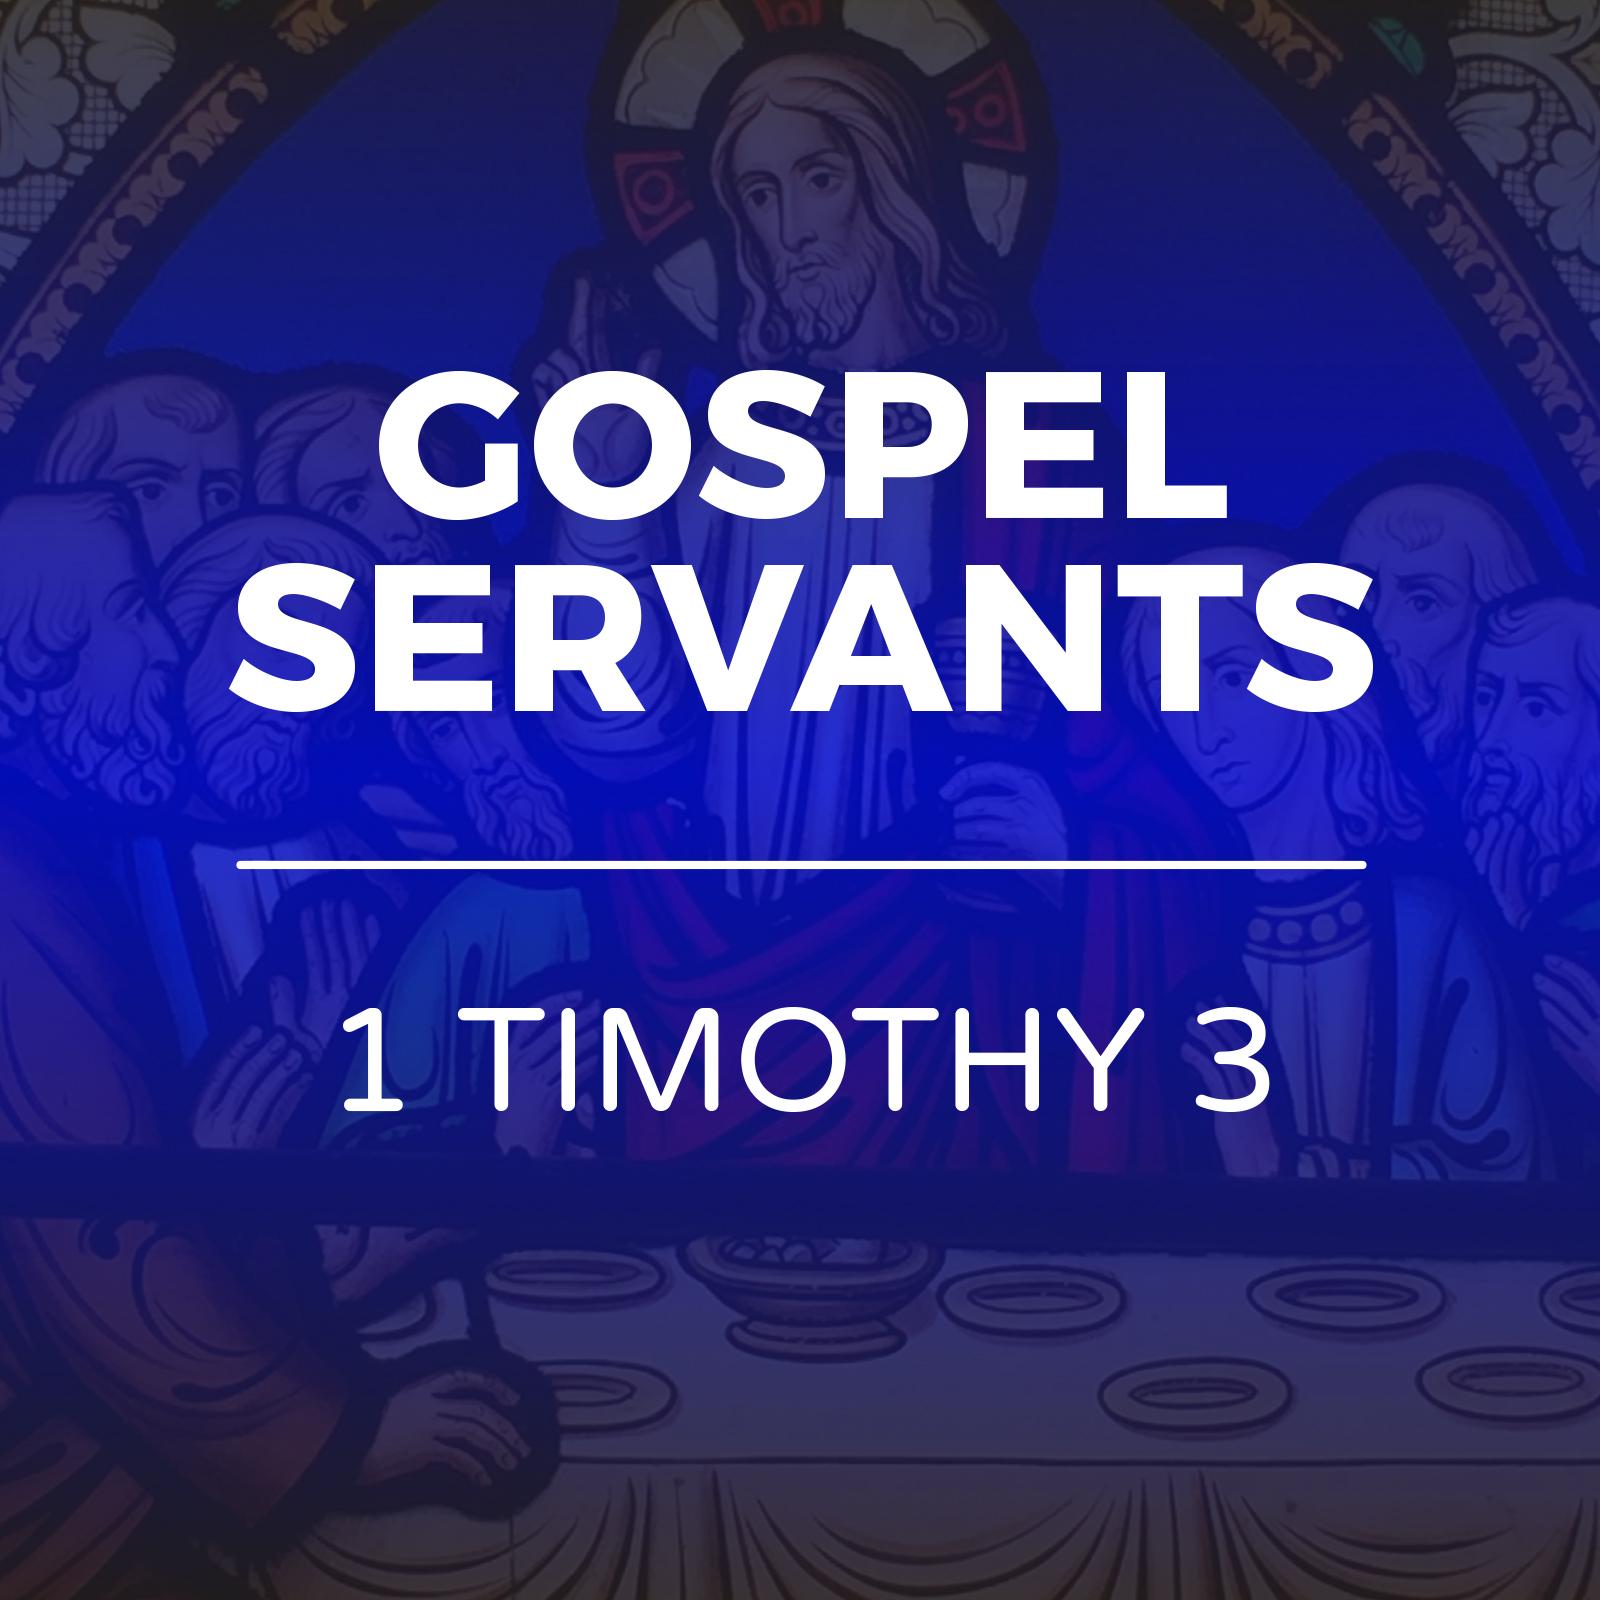 Gospel Servants - 1 Timothy 3 - Hope Church Huddersfield Sermons Series